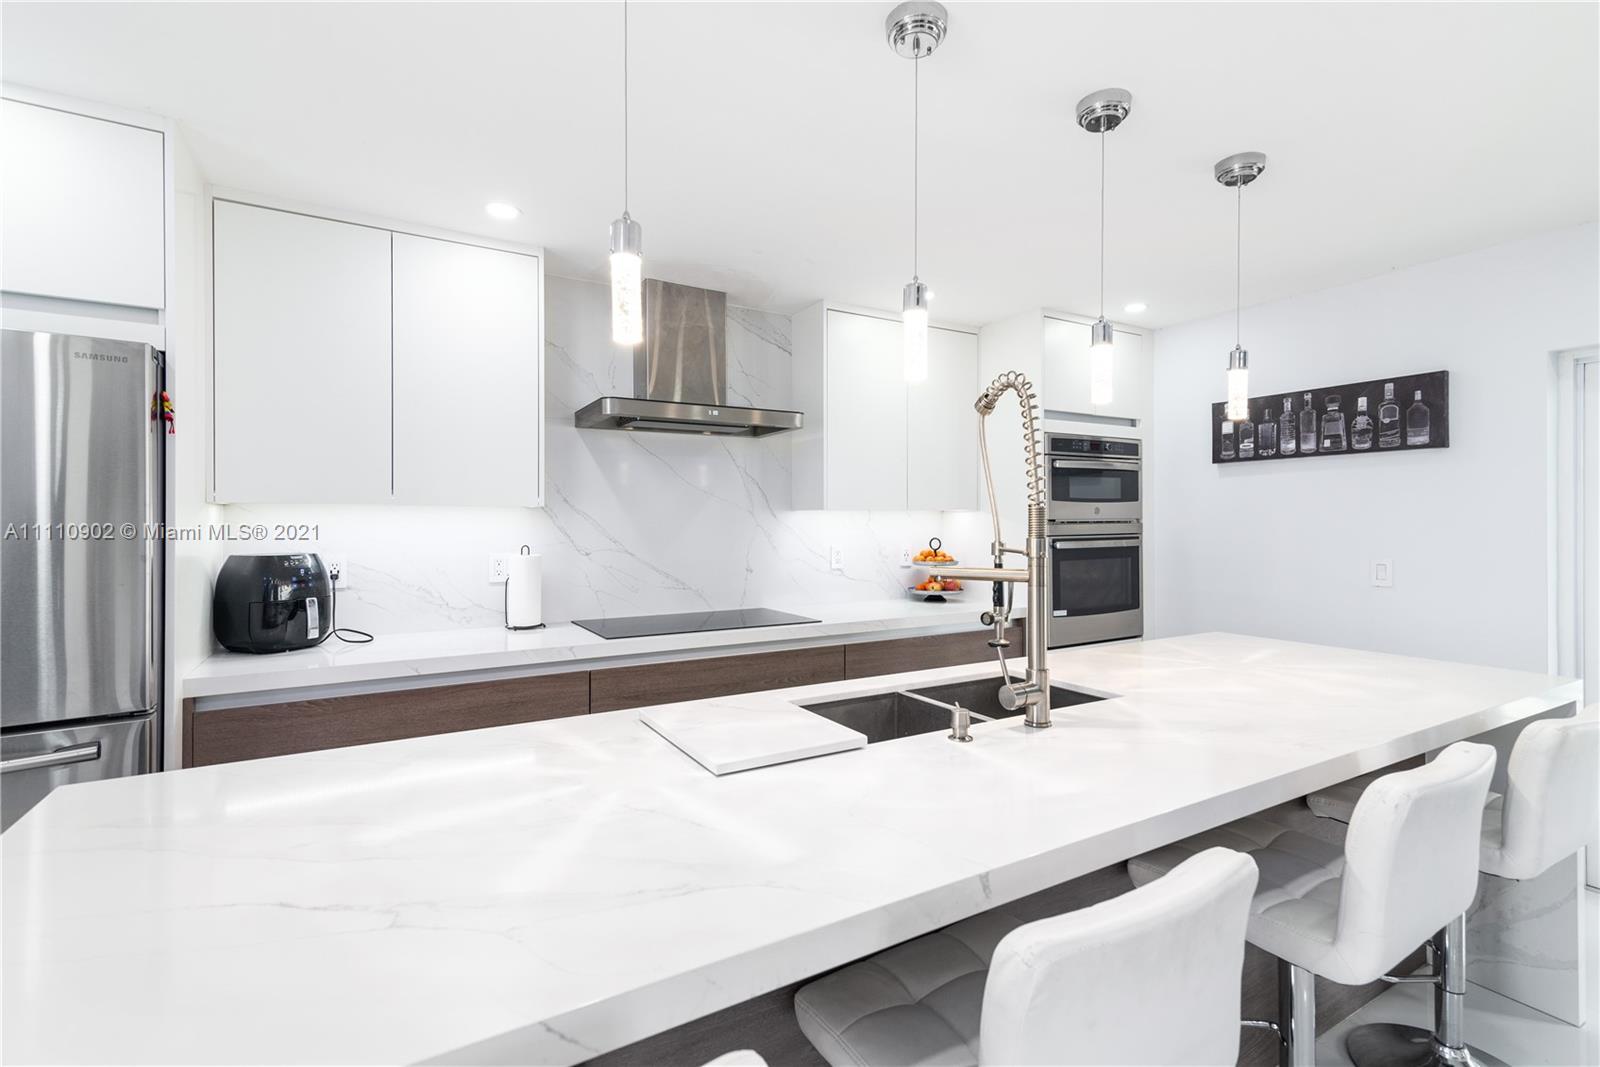 Single Family Home,For Sale,5581 NW 184th Ter, Miami Gardens, Florida 33055,Brickell,realty,broker,condos near me